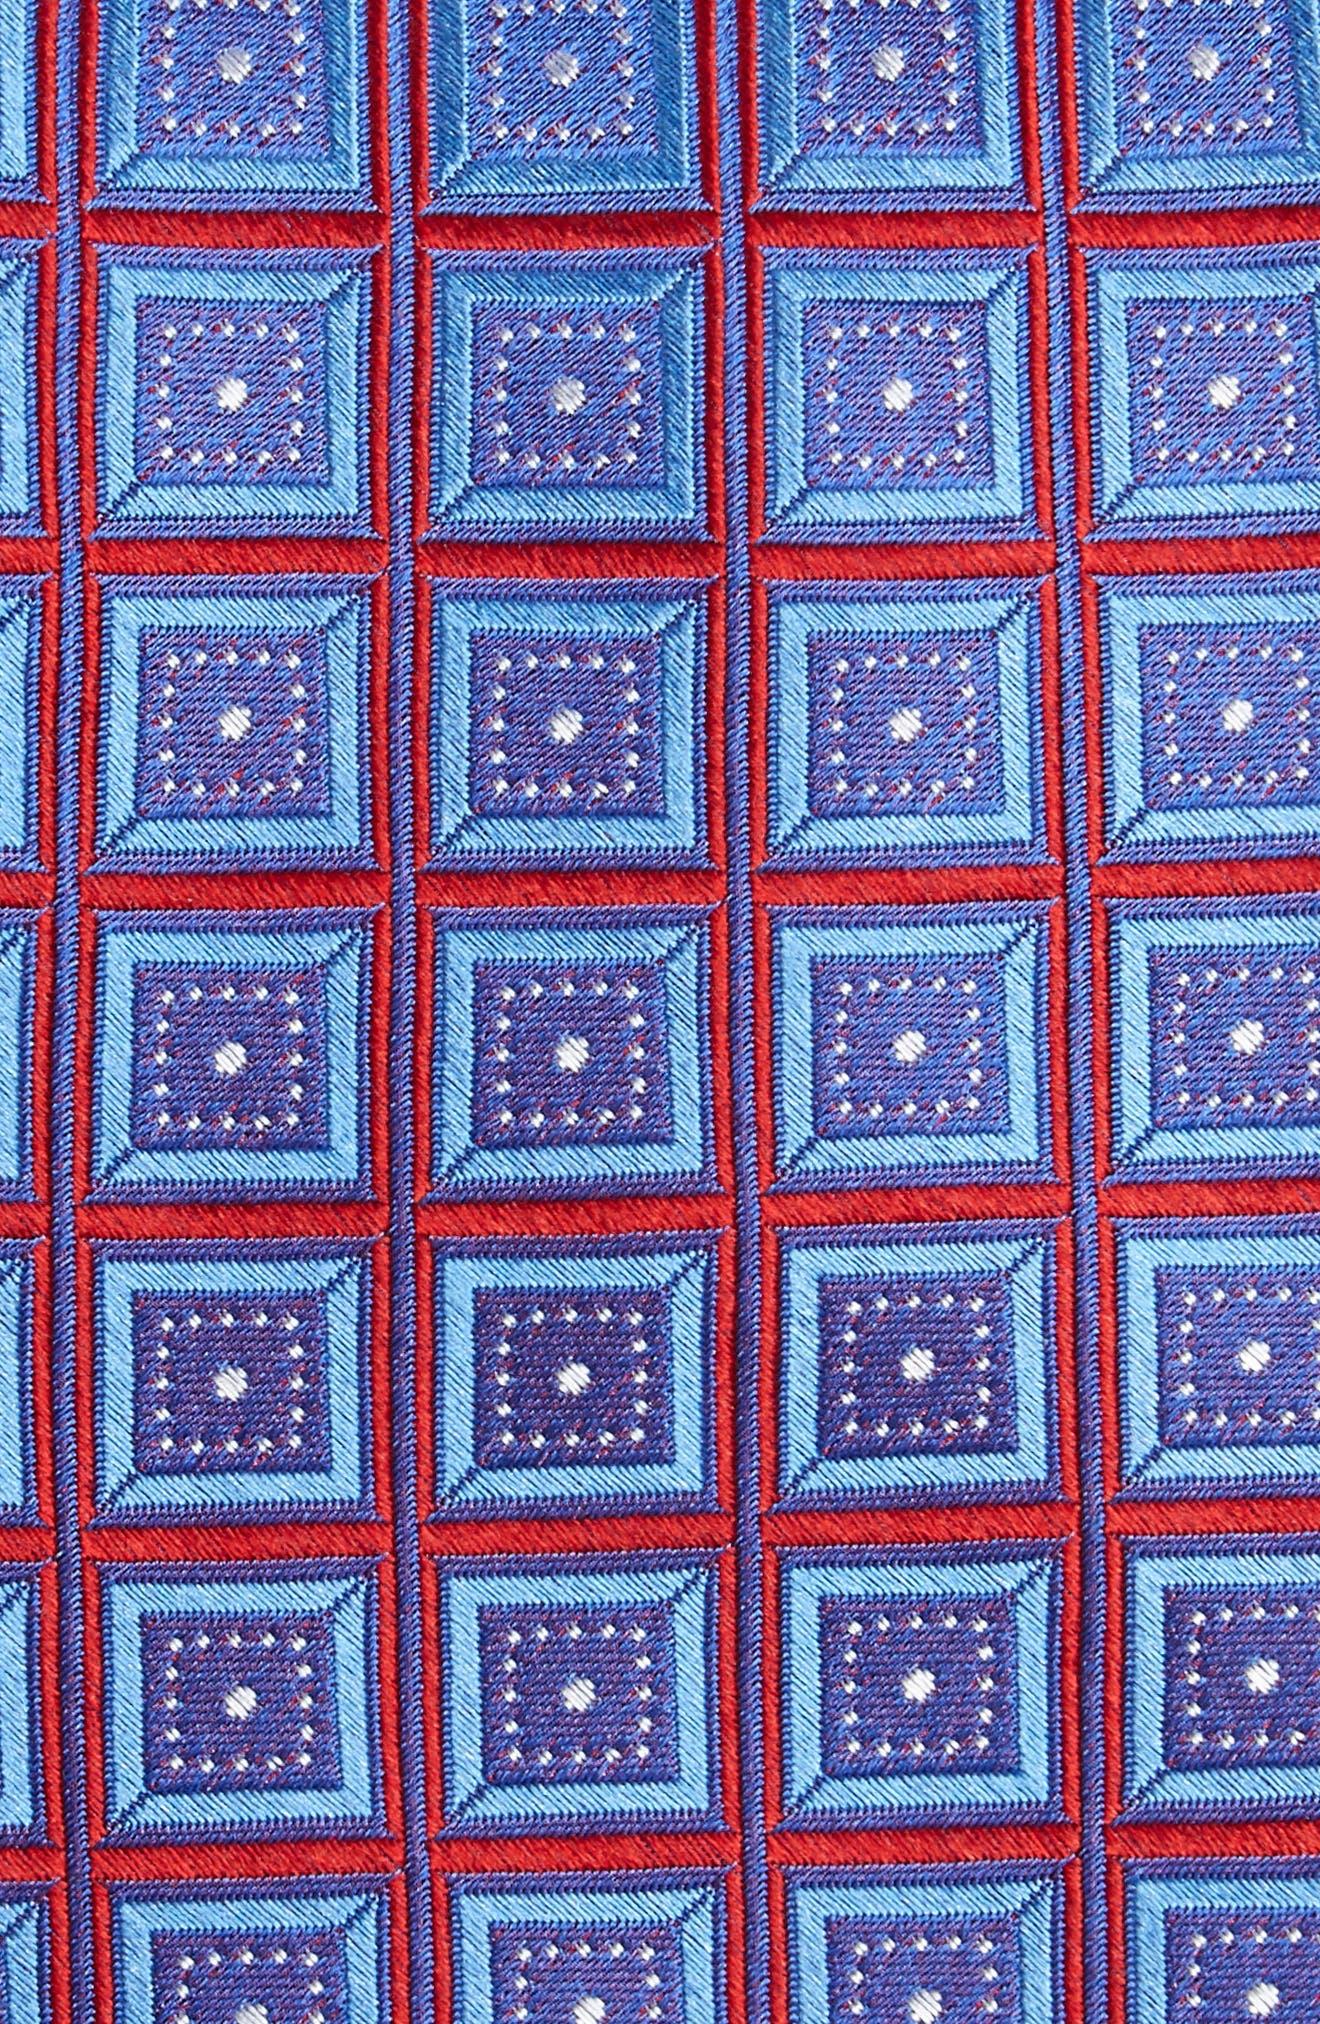 Sublime Squares Geometric Silk Tie,                             Alternate thumbnail 2, color,                             Red Marina